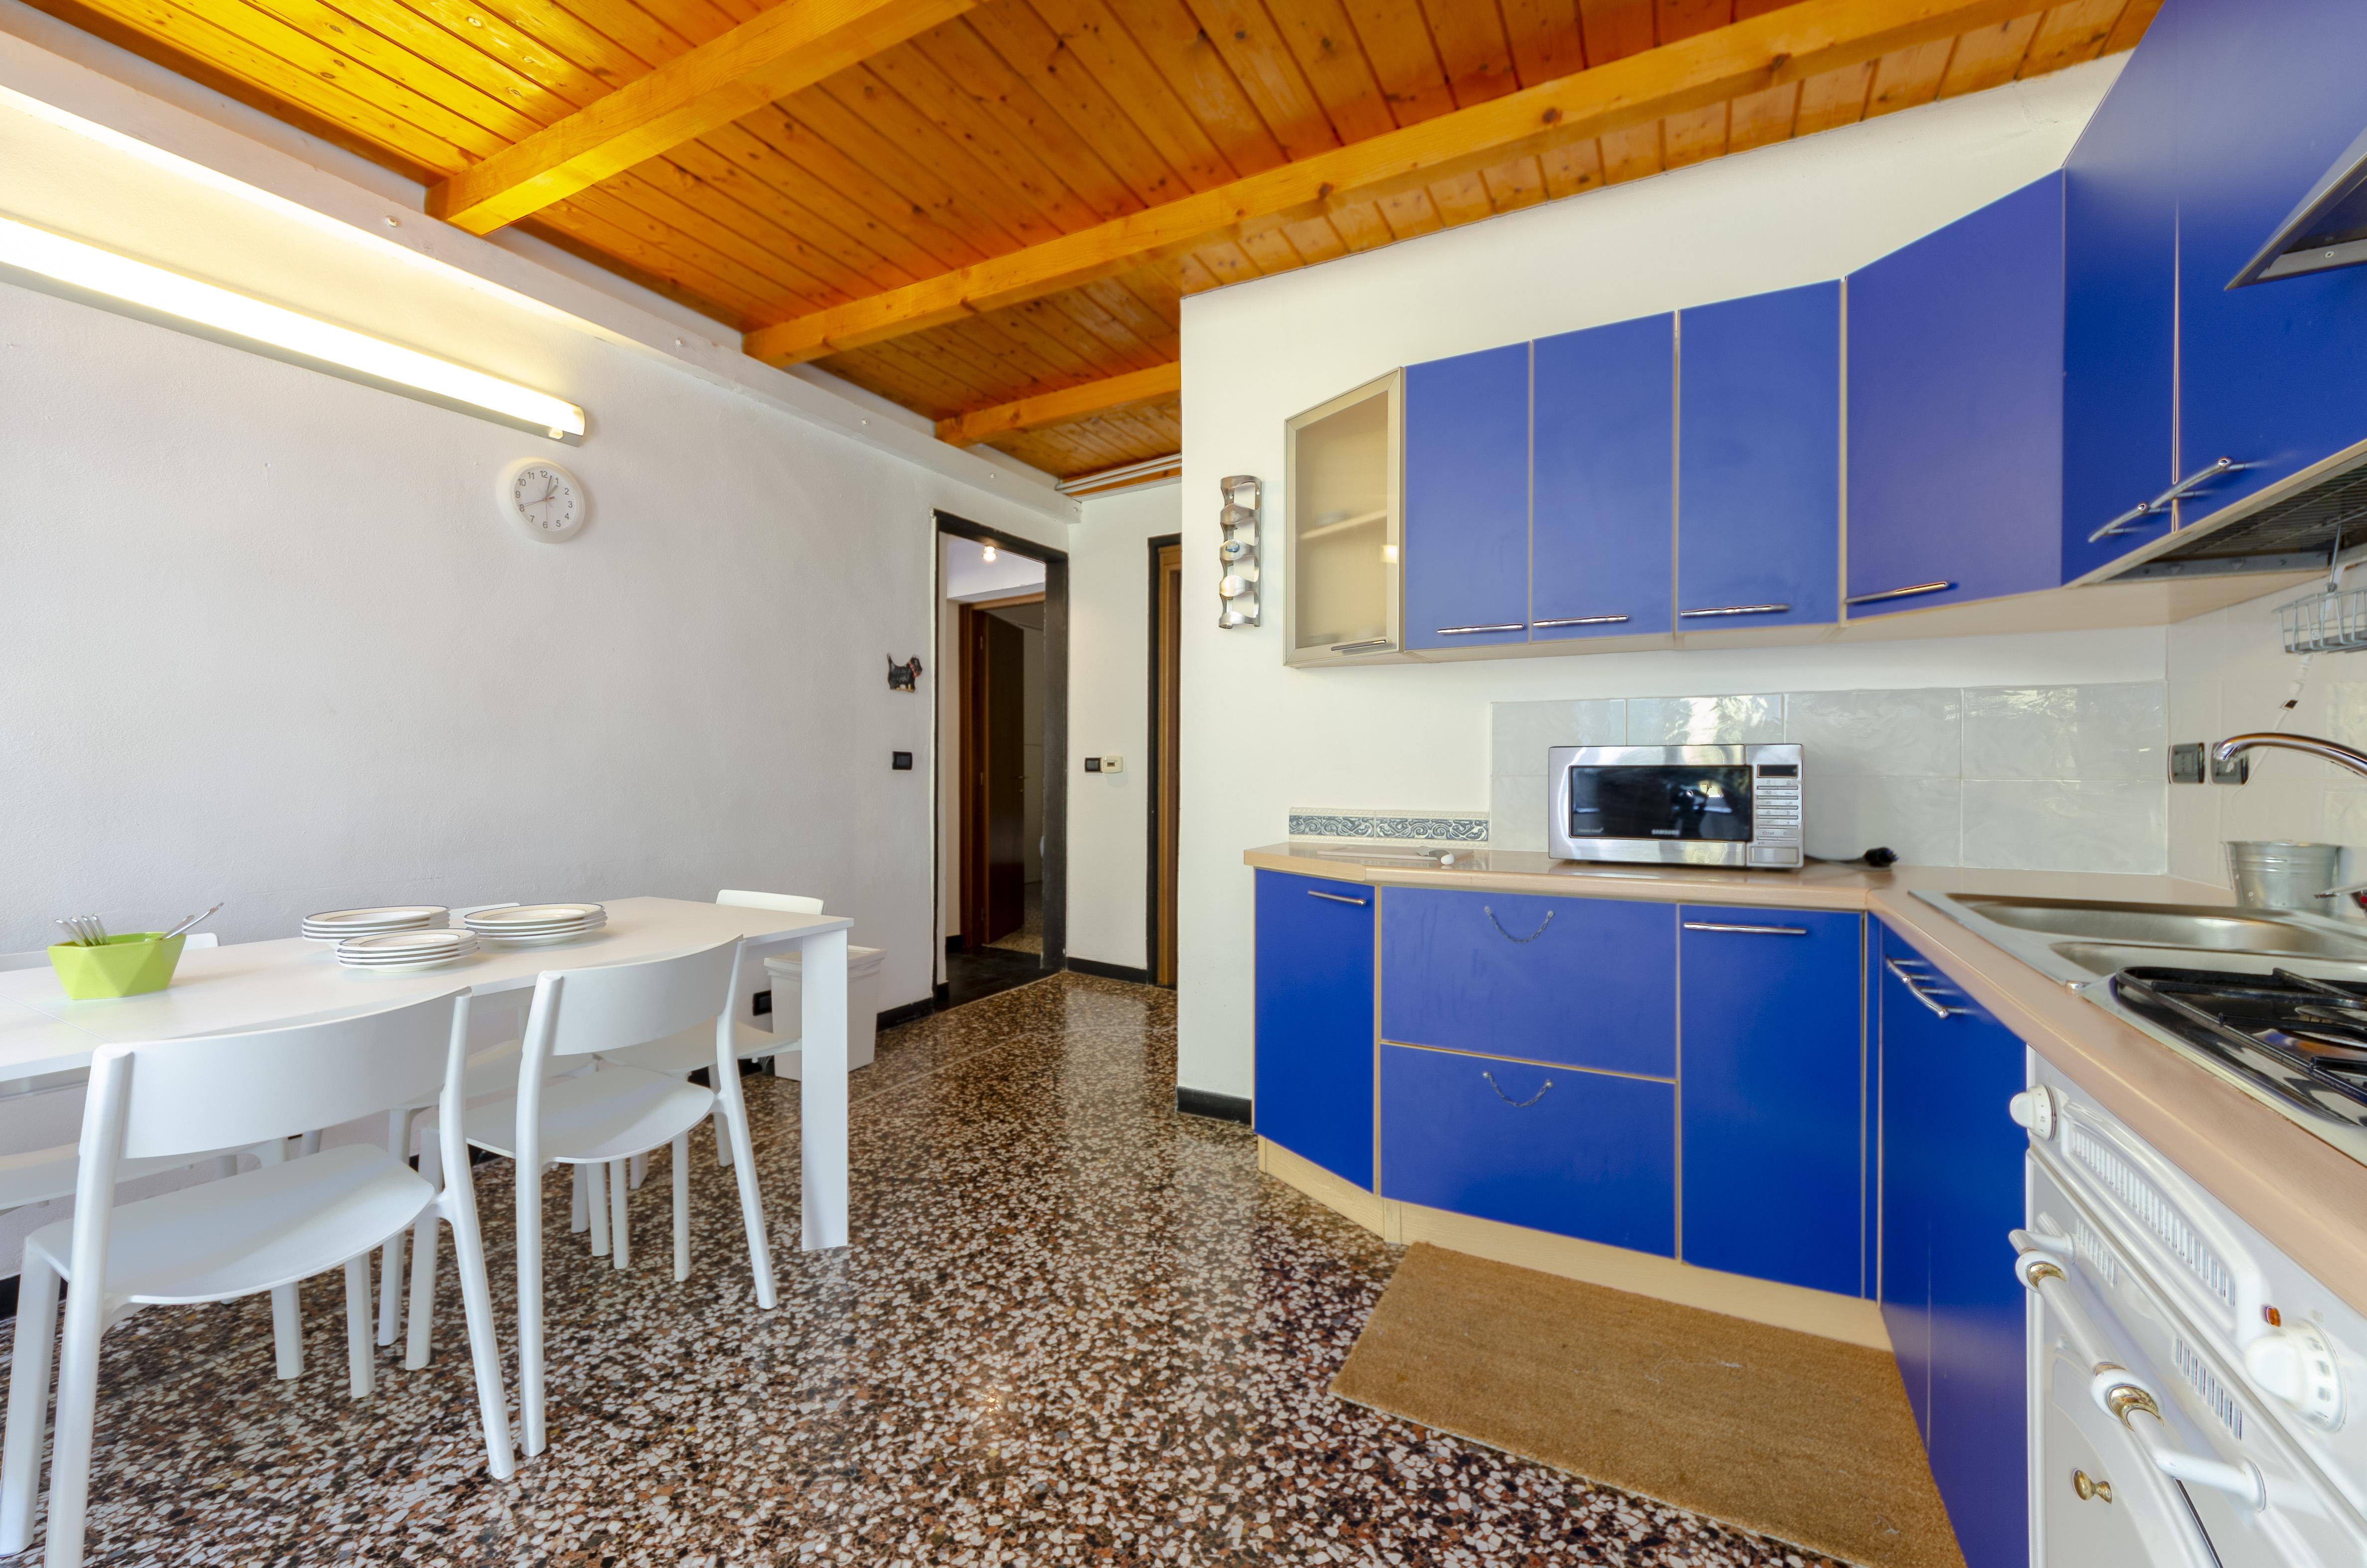 Apartment Hintown Piazza del Roso Genova Universitaria photo 18409277